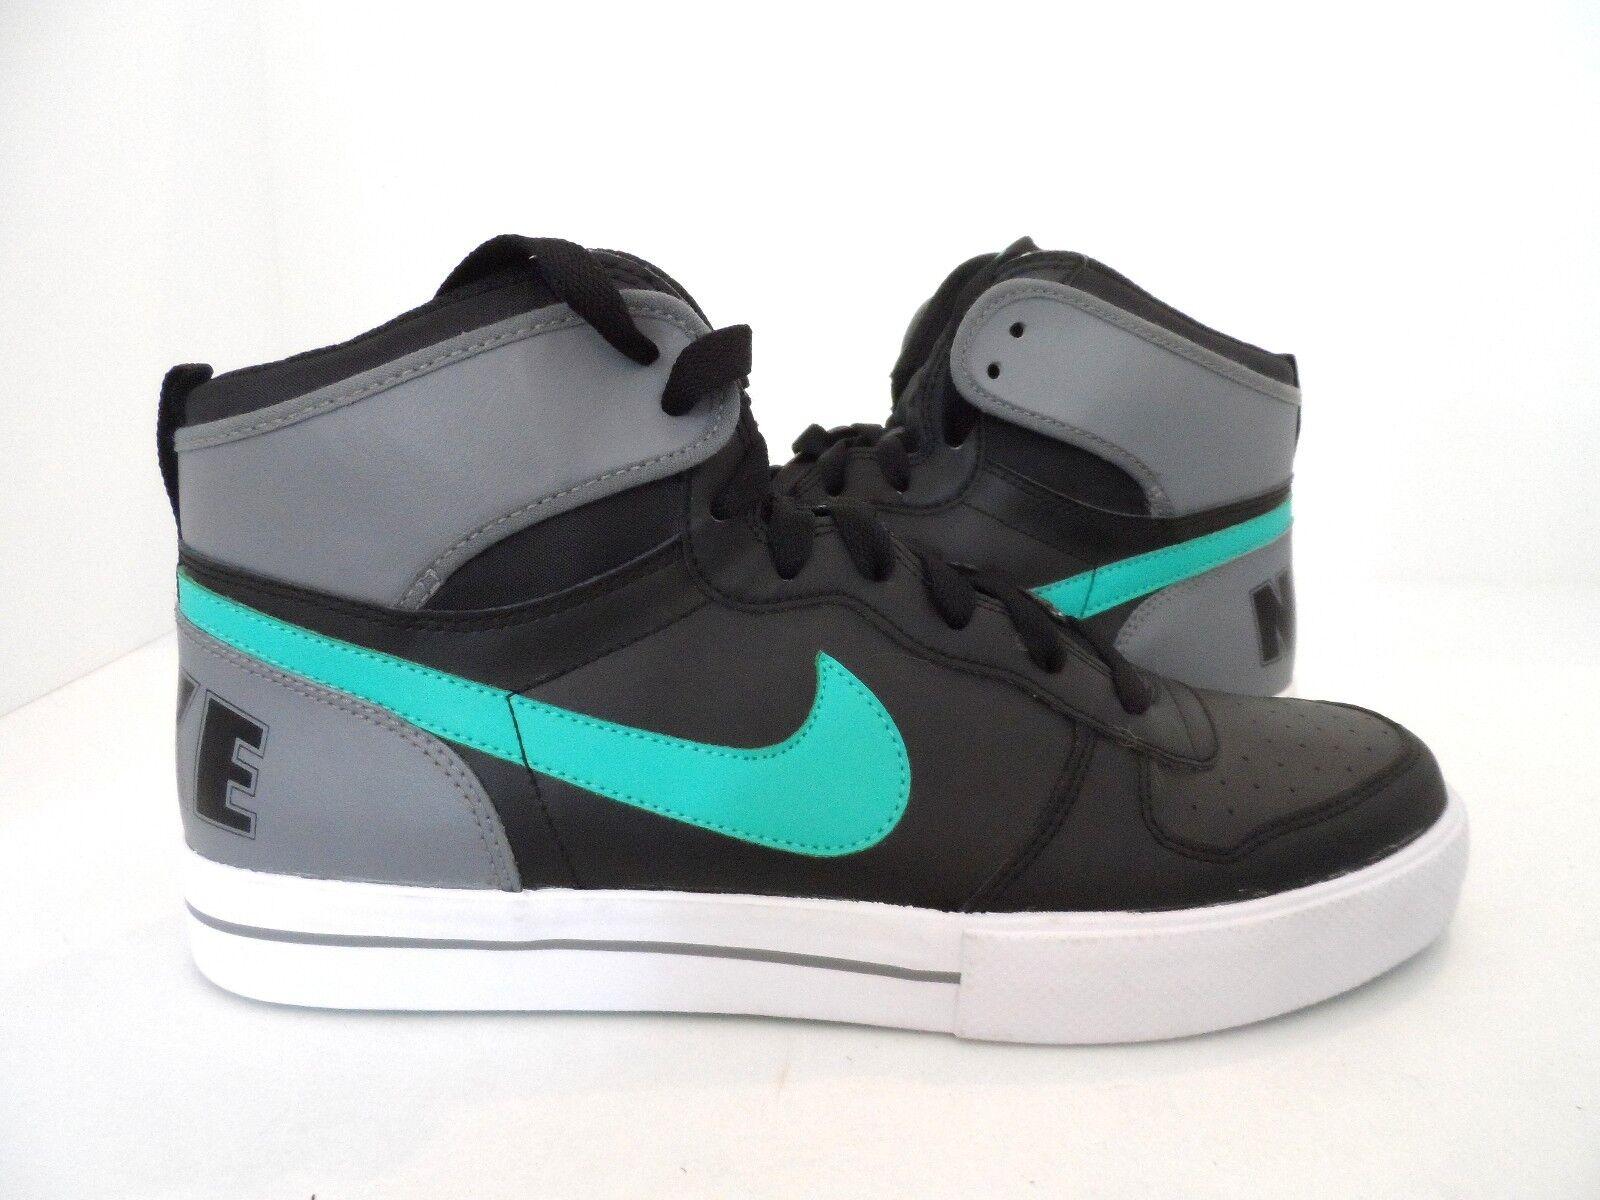 Nike Men's Big High AC Basketball Shoes Black Teal White Comfortable